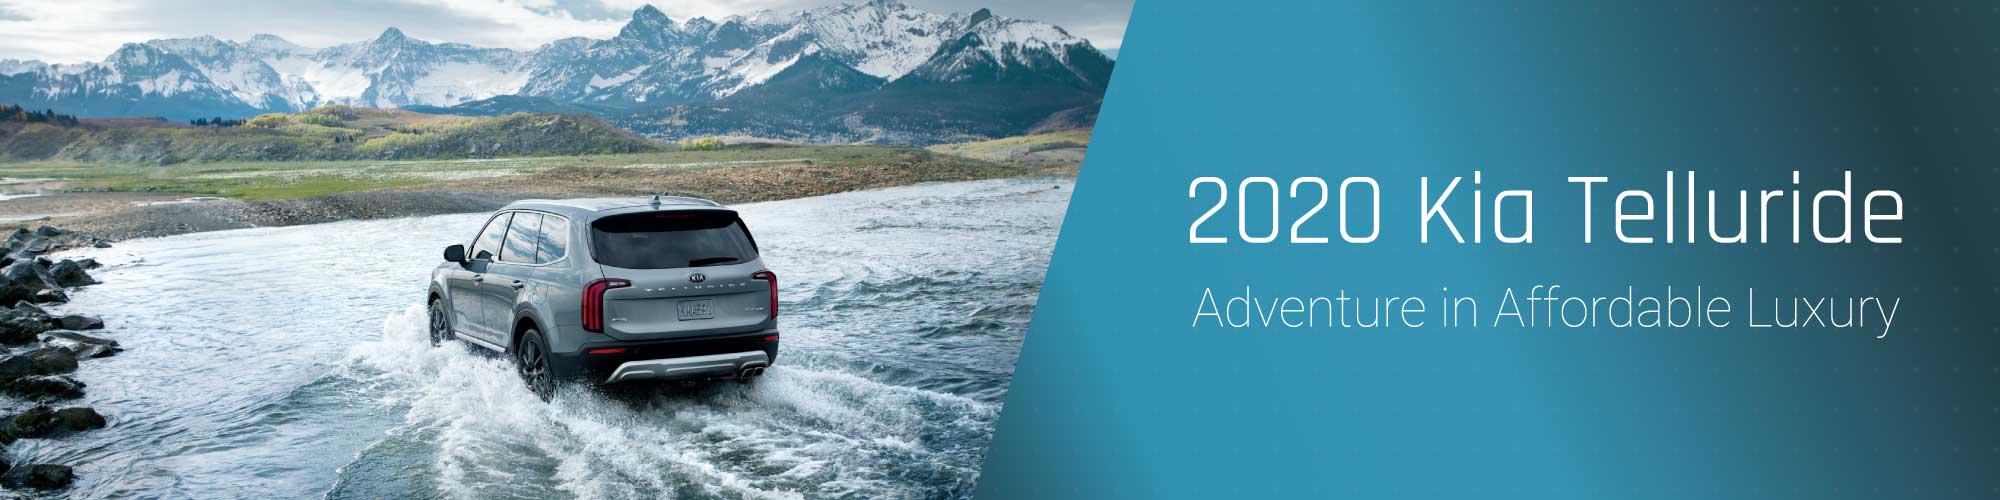 2020 Kia Telluride. Adventure in Affordable Luxury